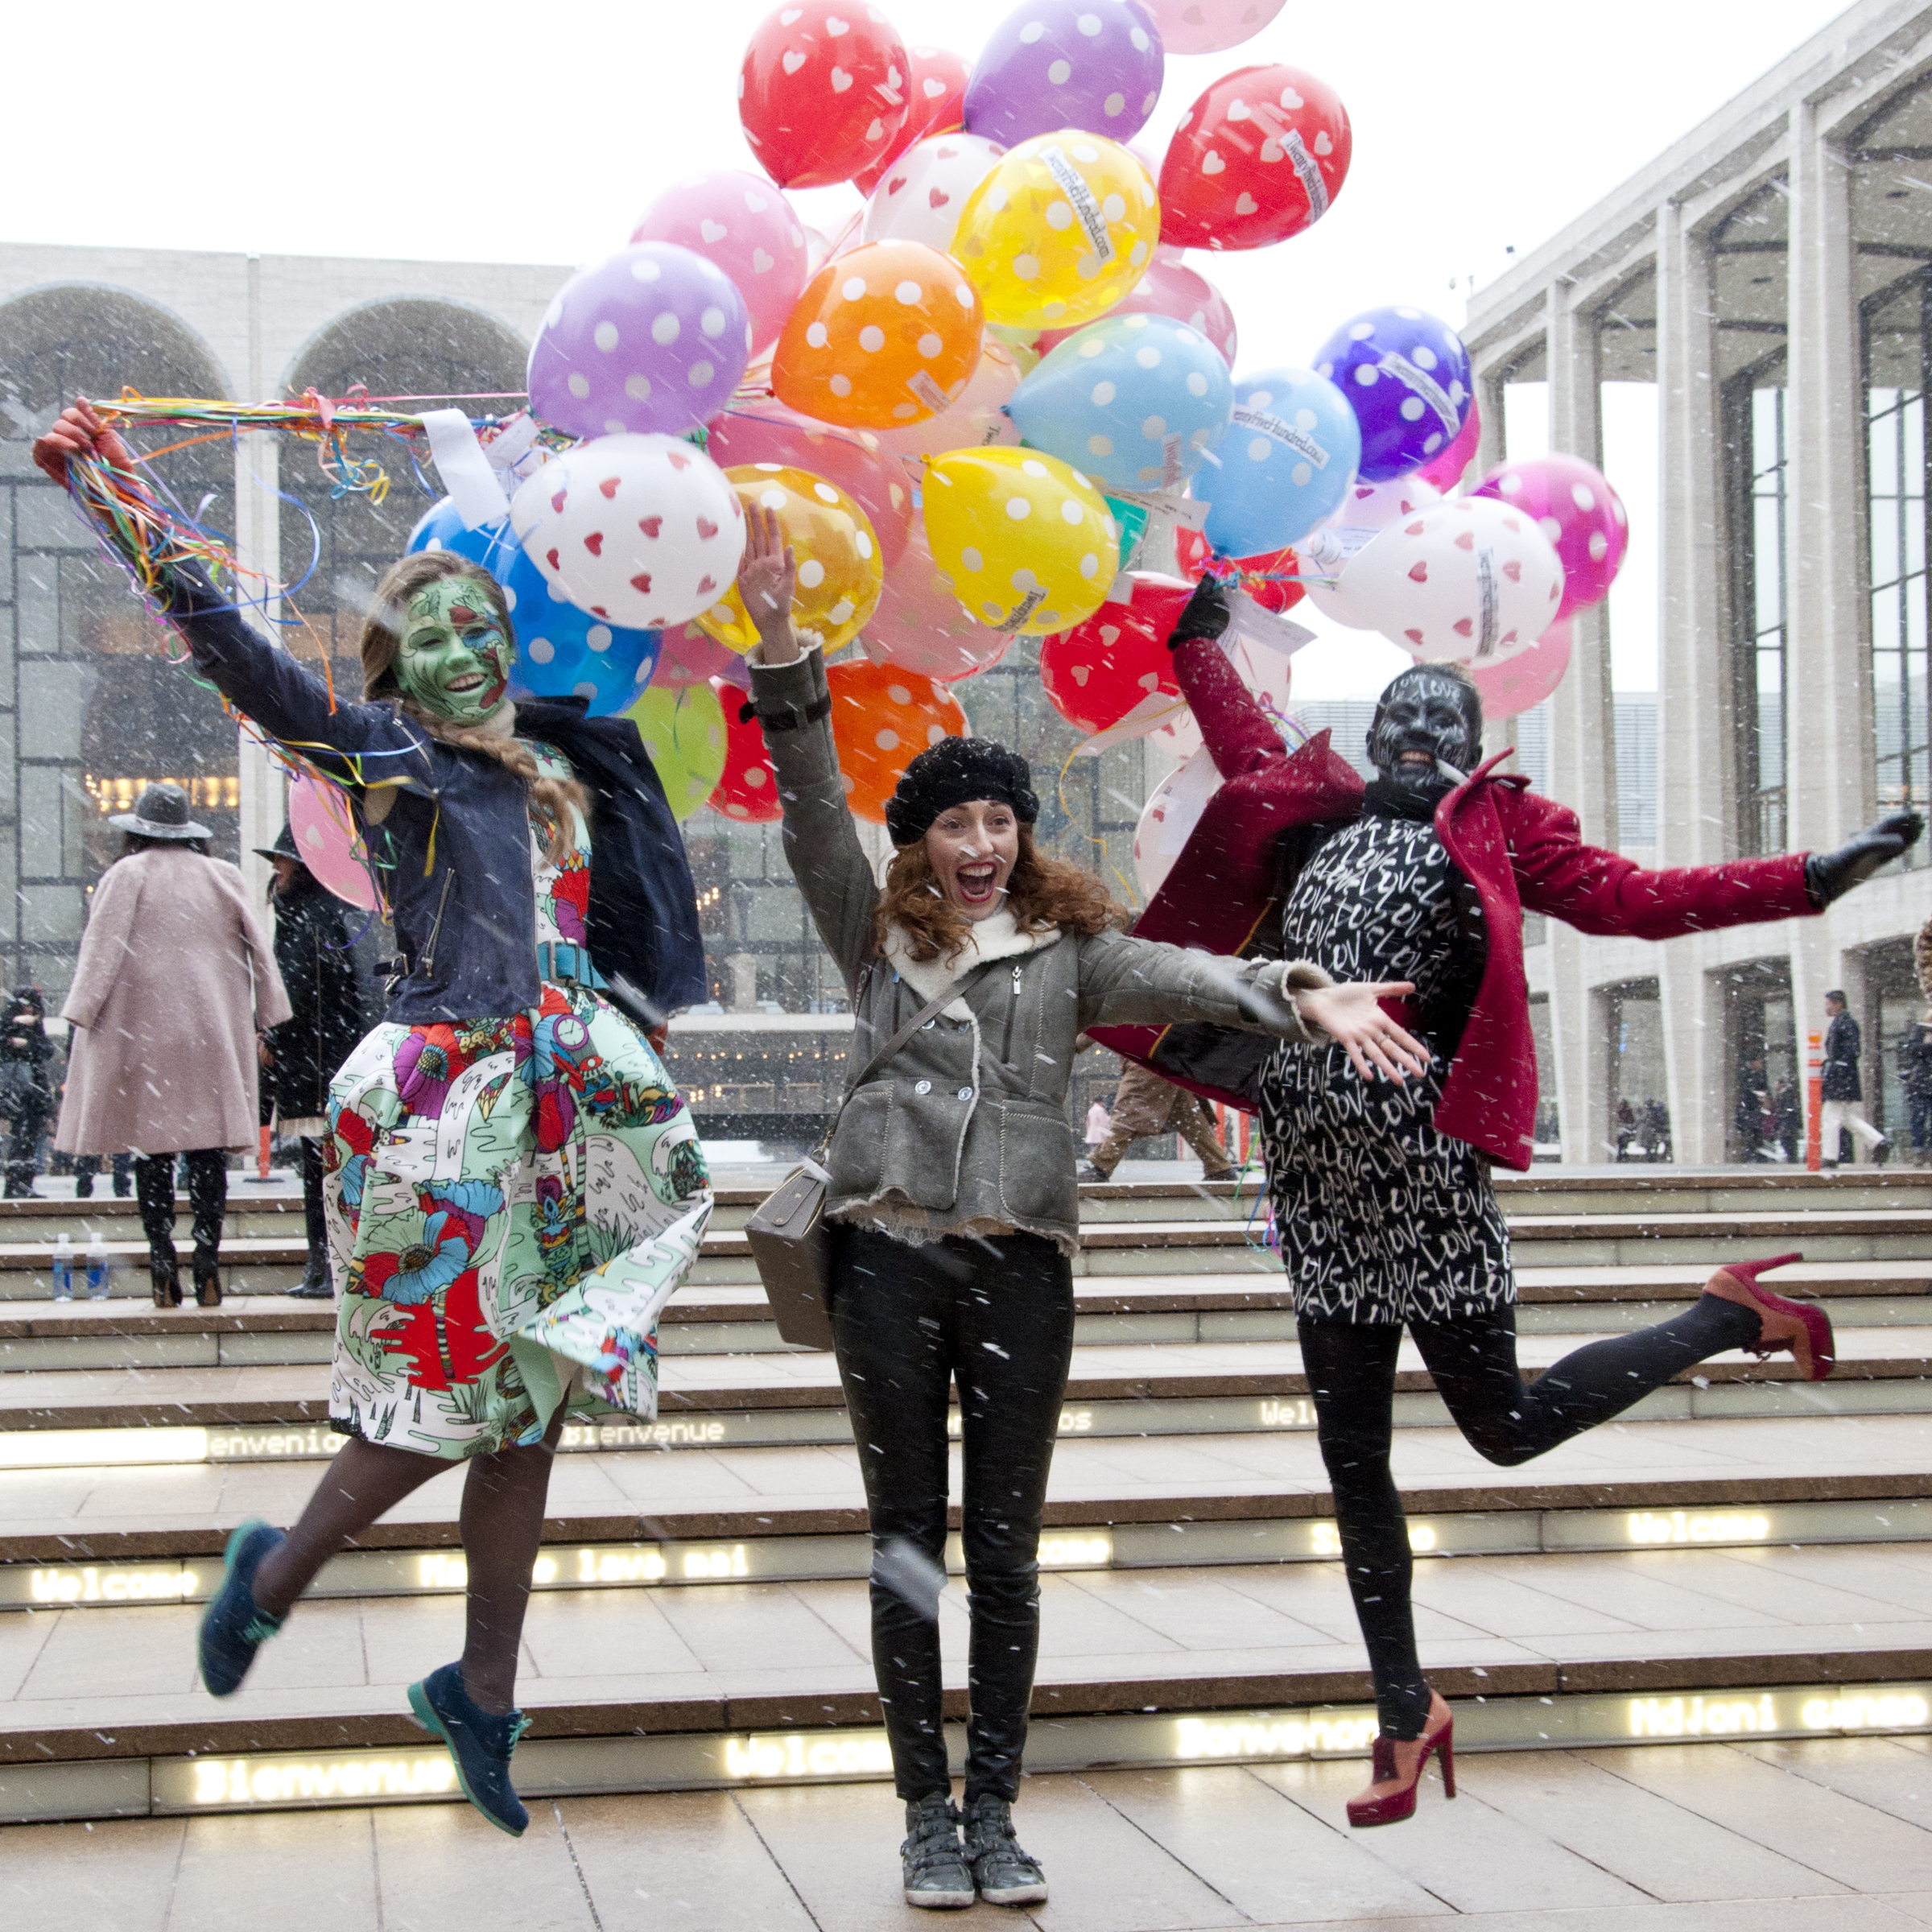 (L to R) Ksenia Lambert,Saida, and Elena Albrant spreading the love for Twenty Five Hundred , makeup by  Anastasia Durasova